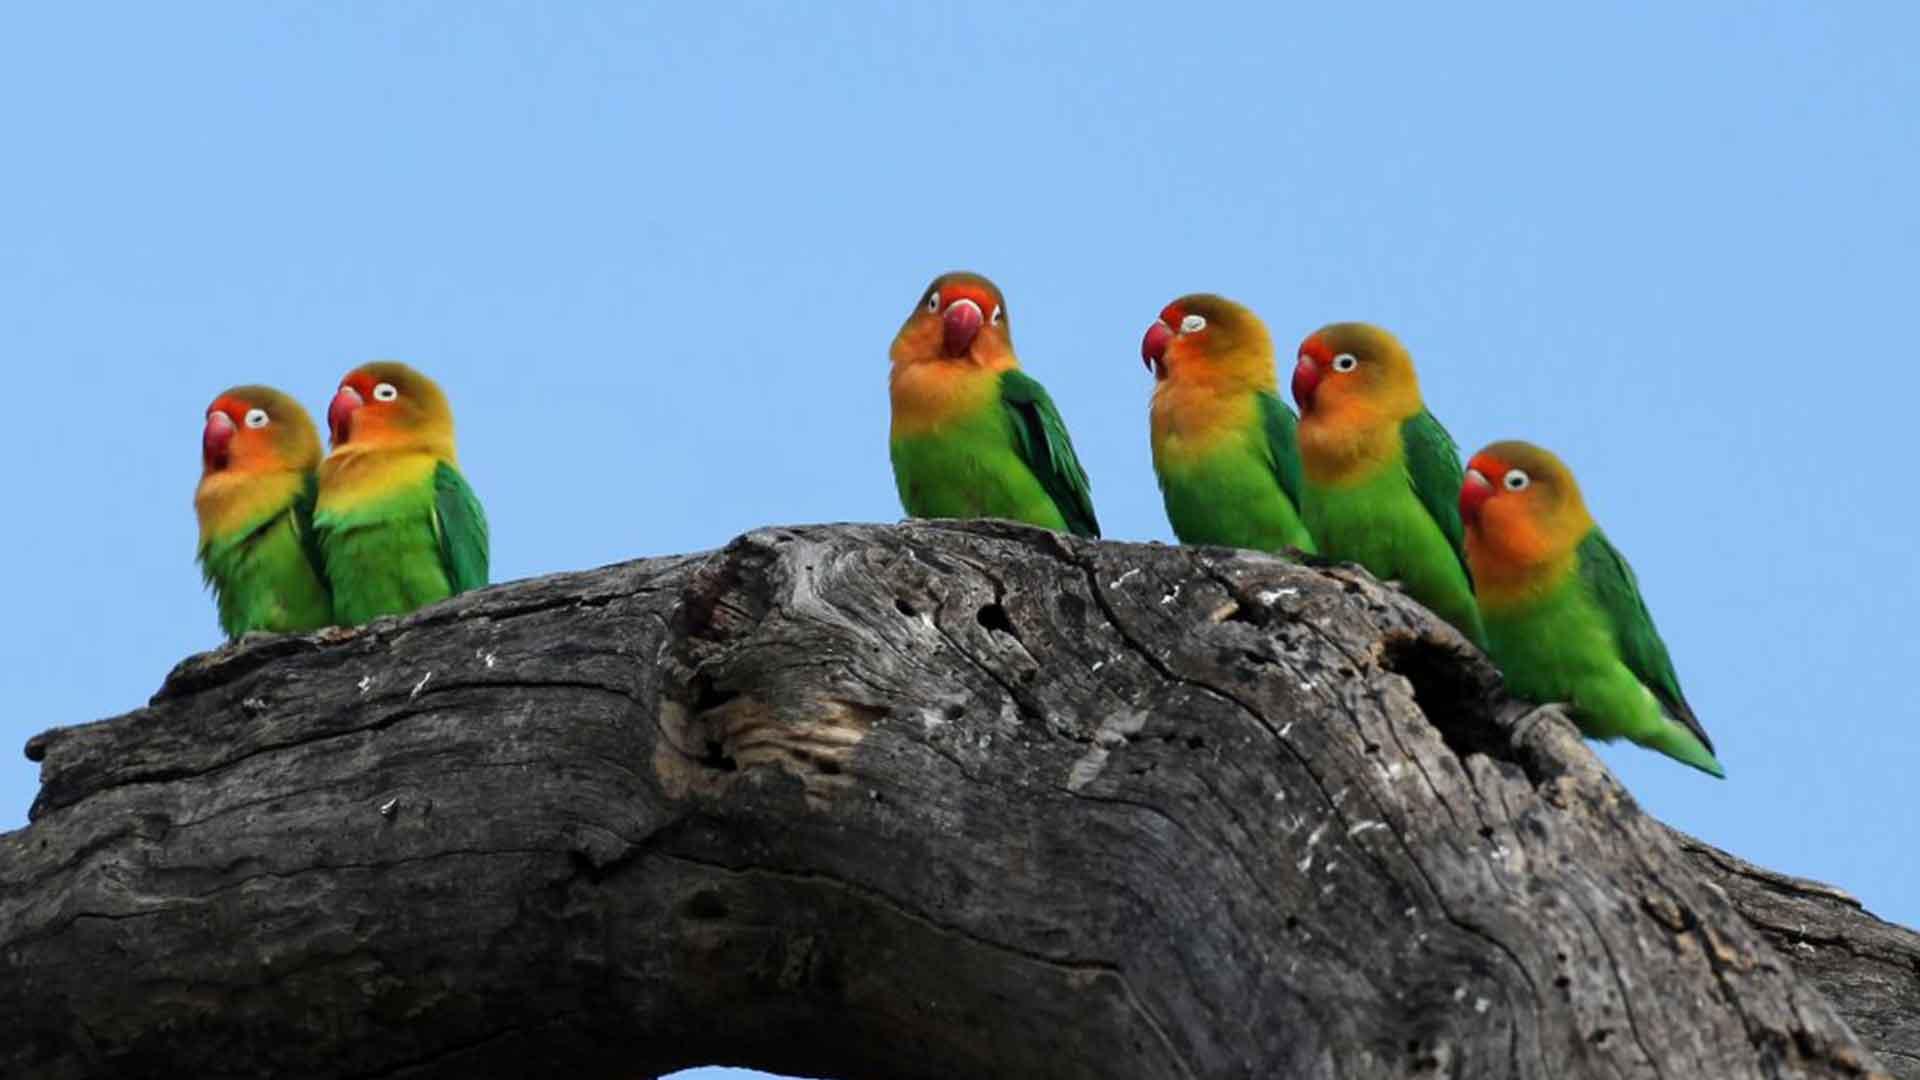 Love birds sitting on a log in Serengeti National park on tanzania safari tour